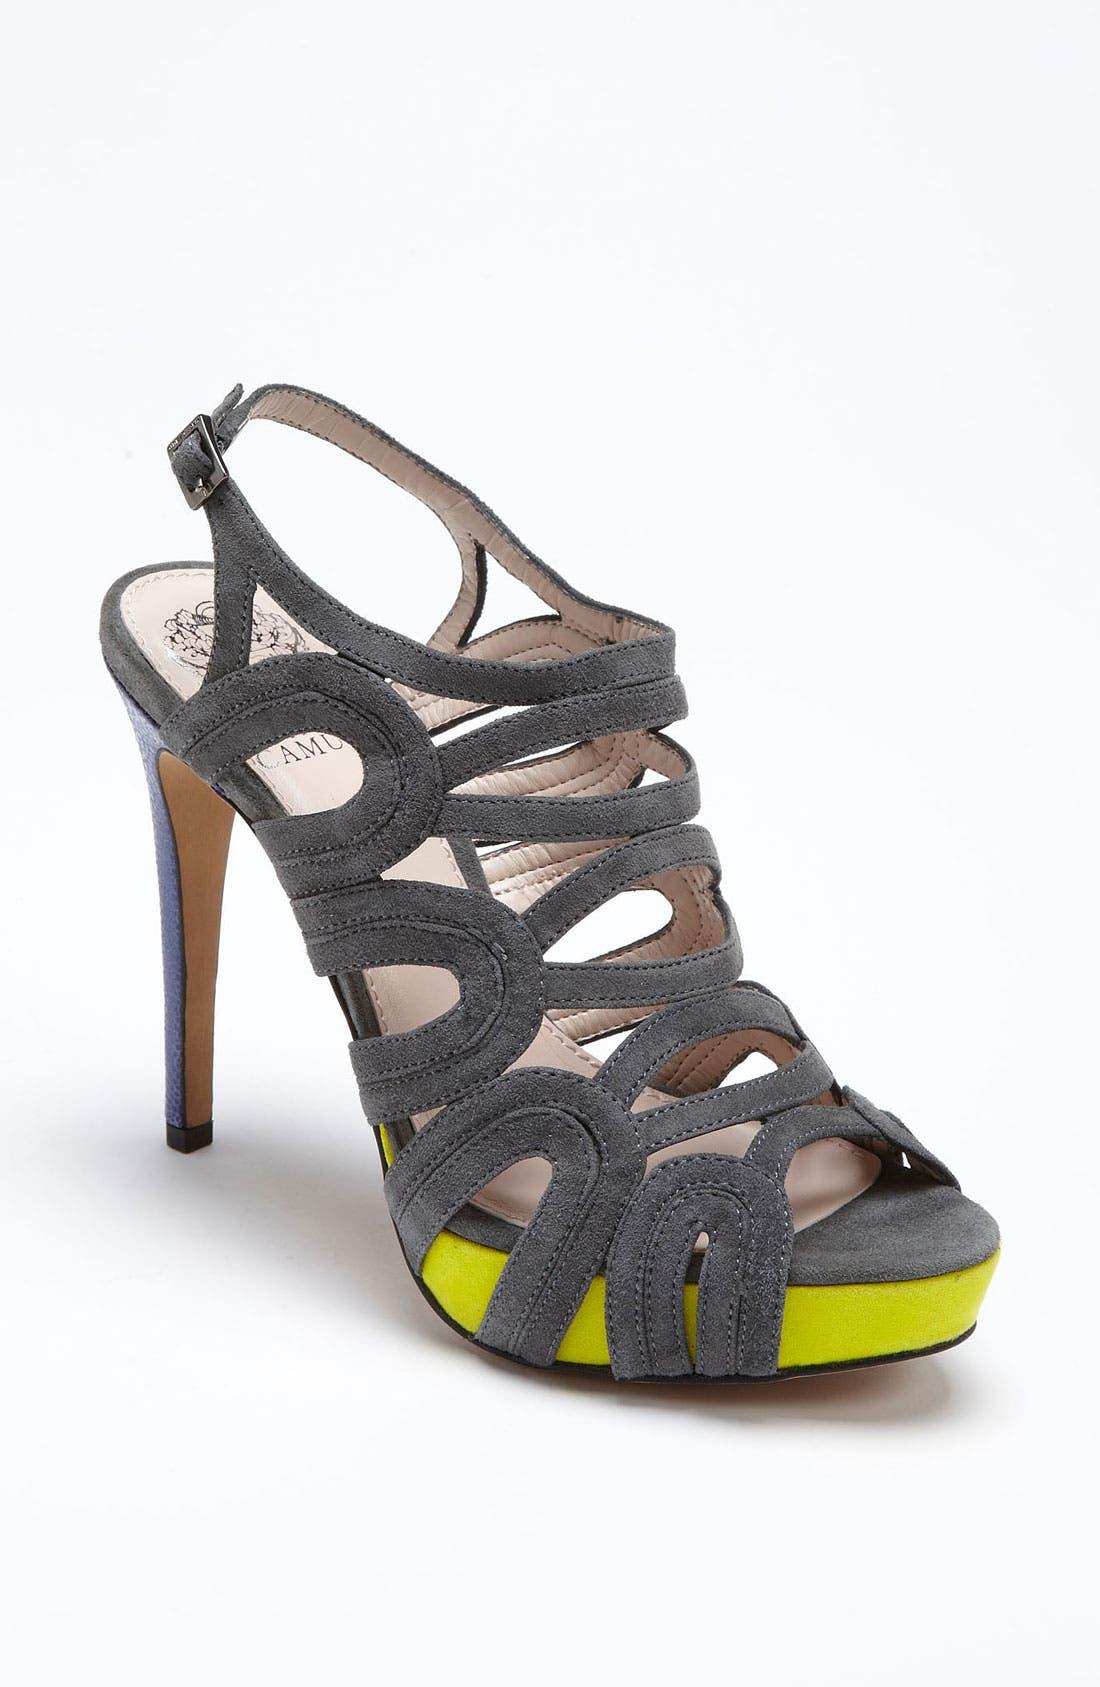 Main Image - Vince Camuto 'Jiris' Sandal